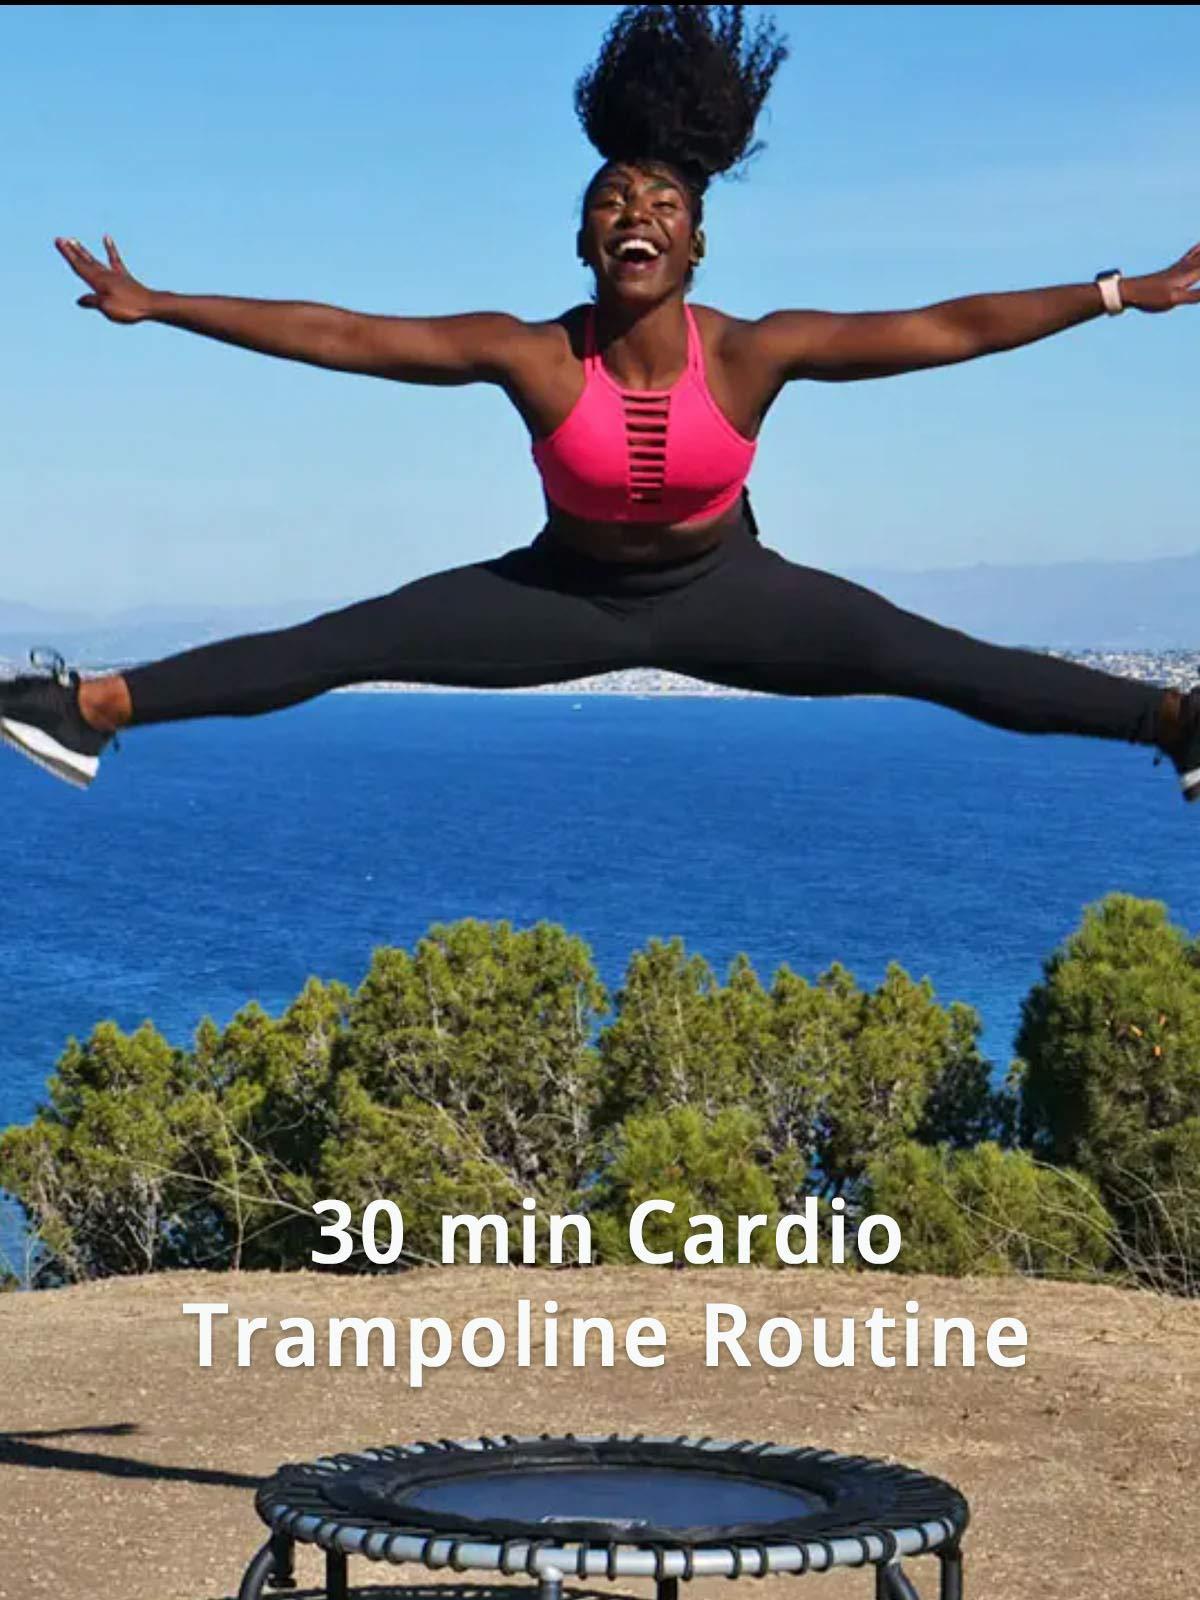 30 min Cardio Trampoline Routine